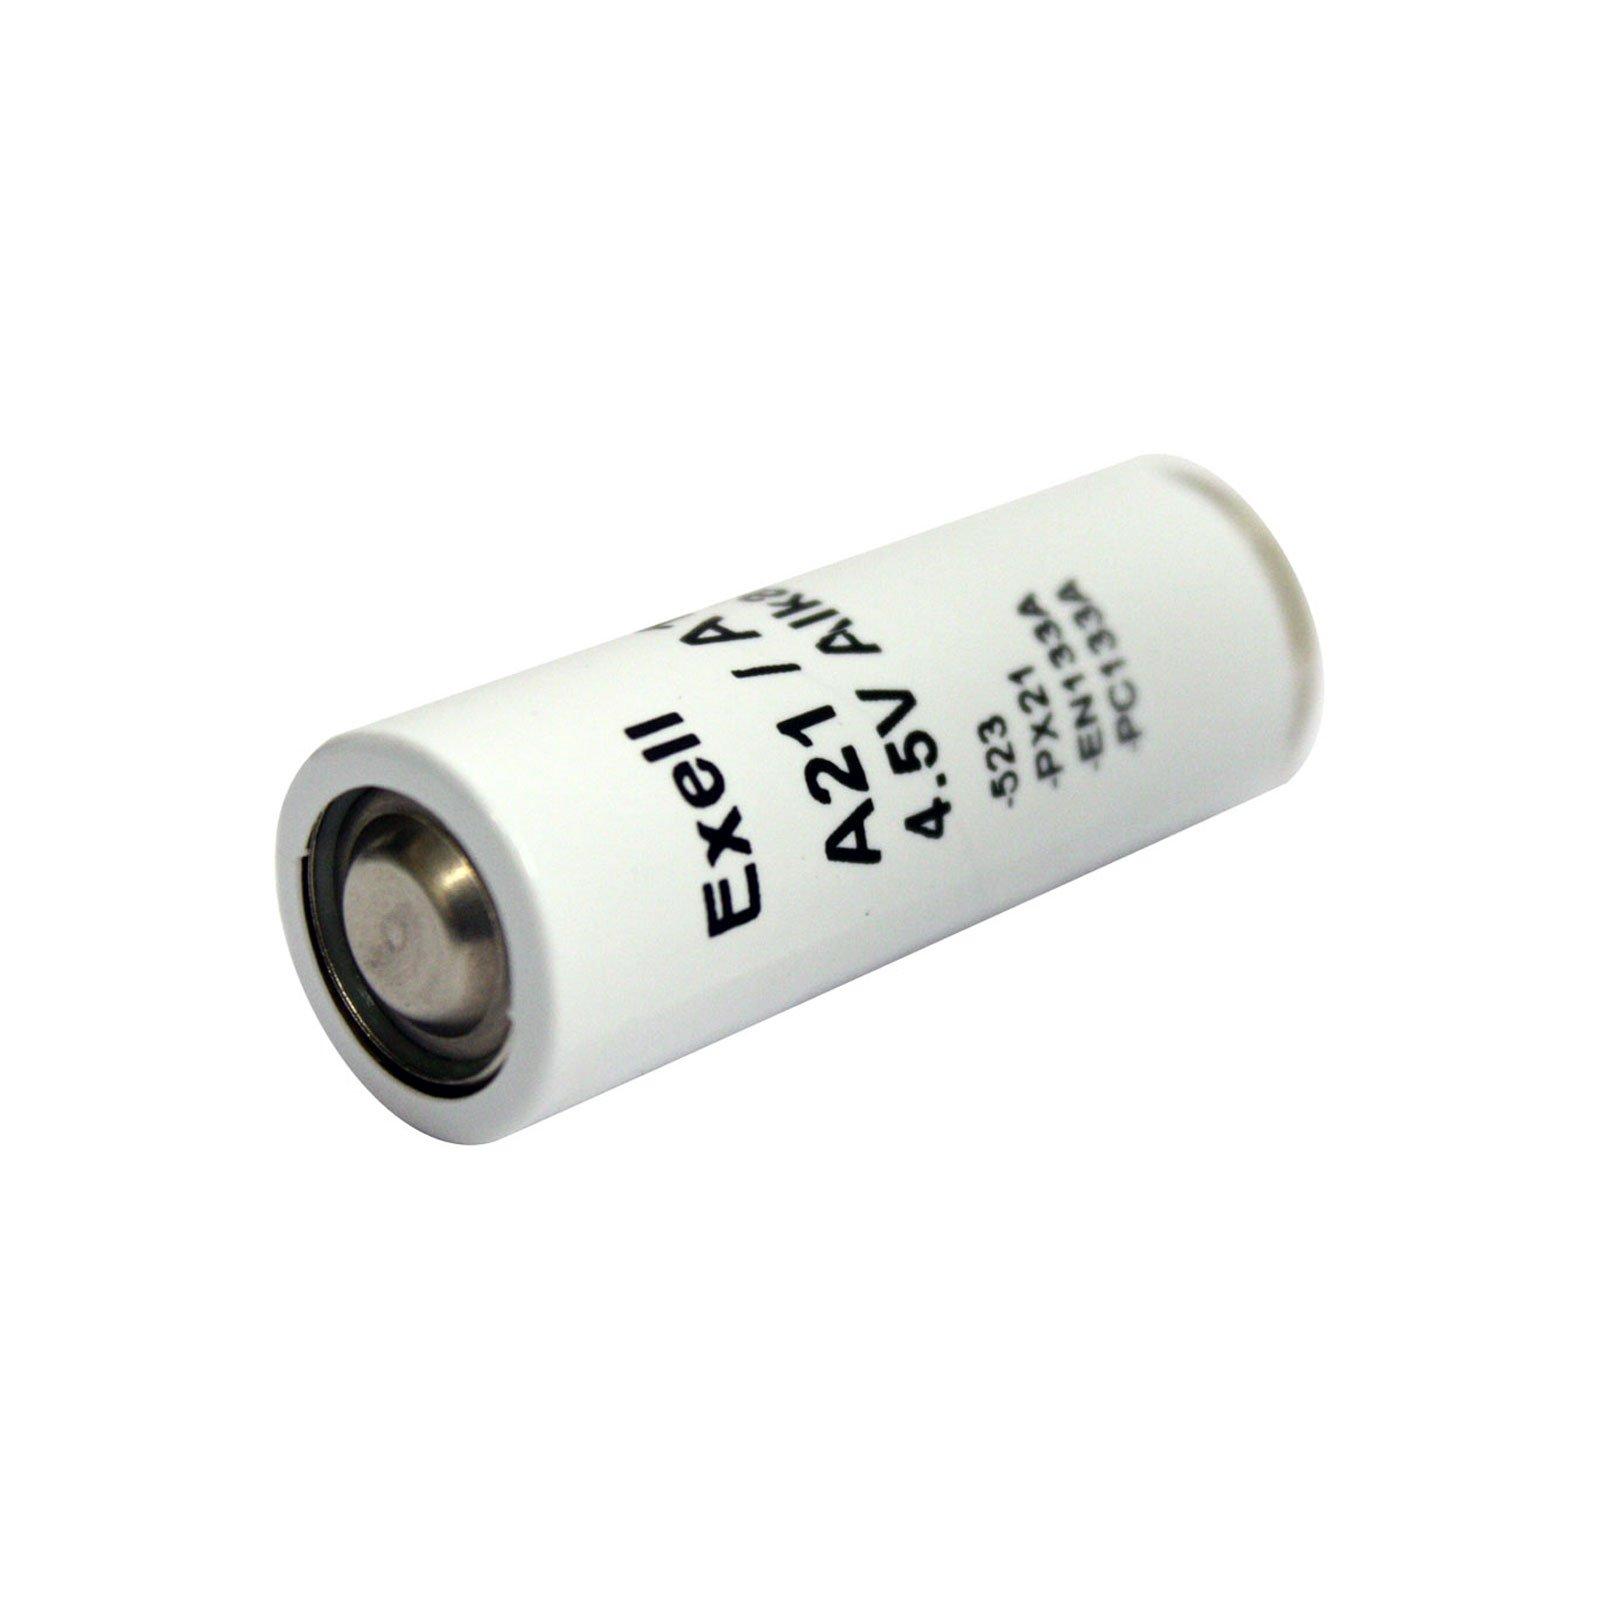 Exell Battery A21PX 4.5-Volt Alkaline Battery (White)